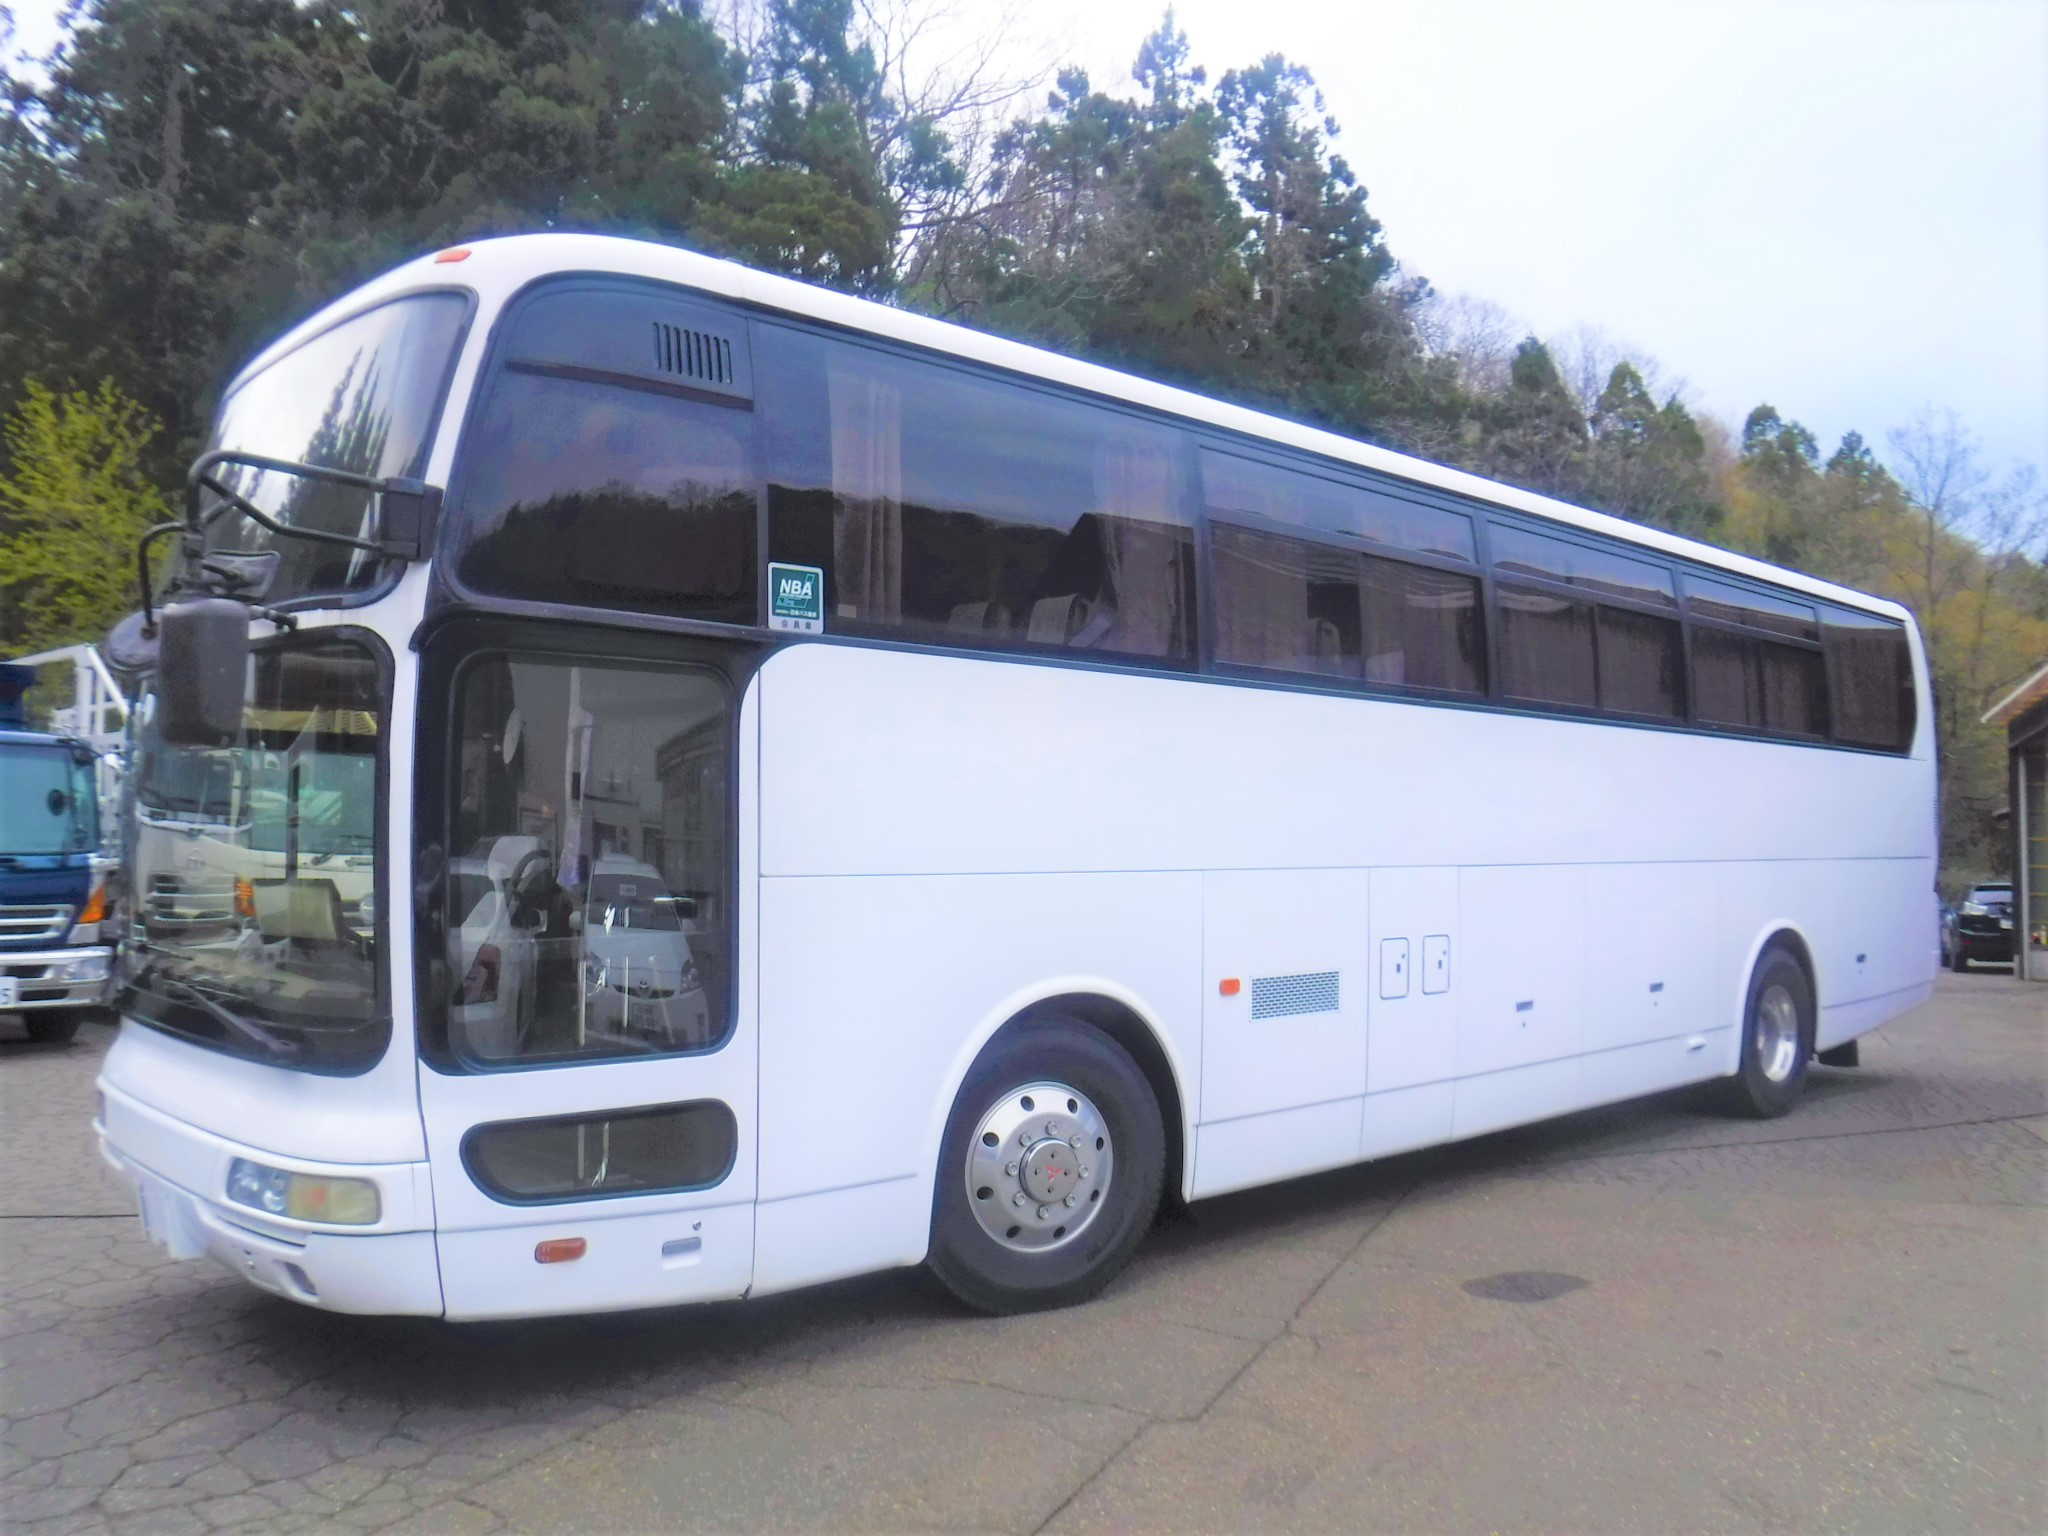 ch12969